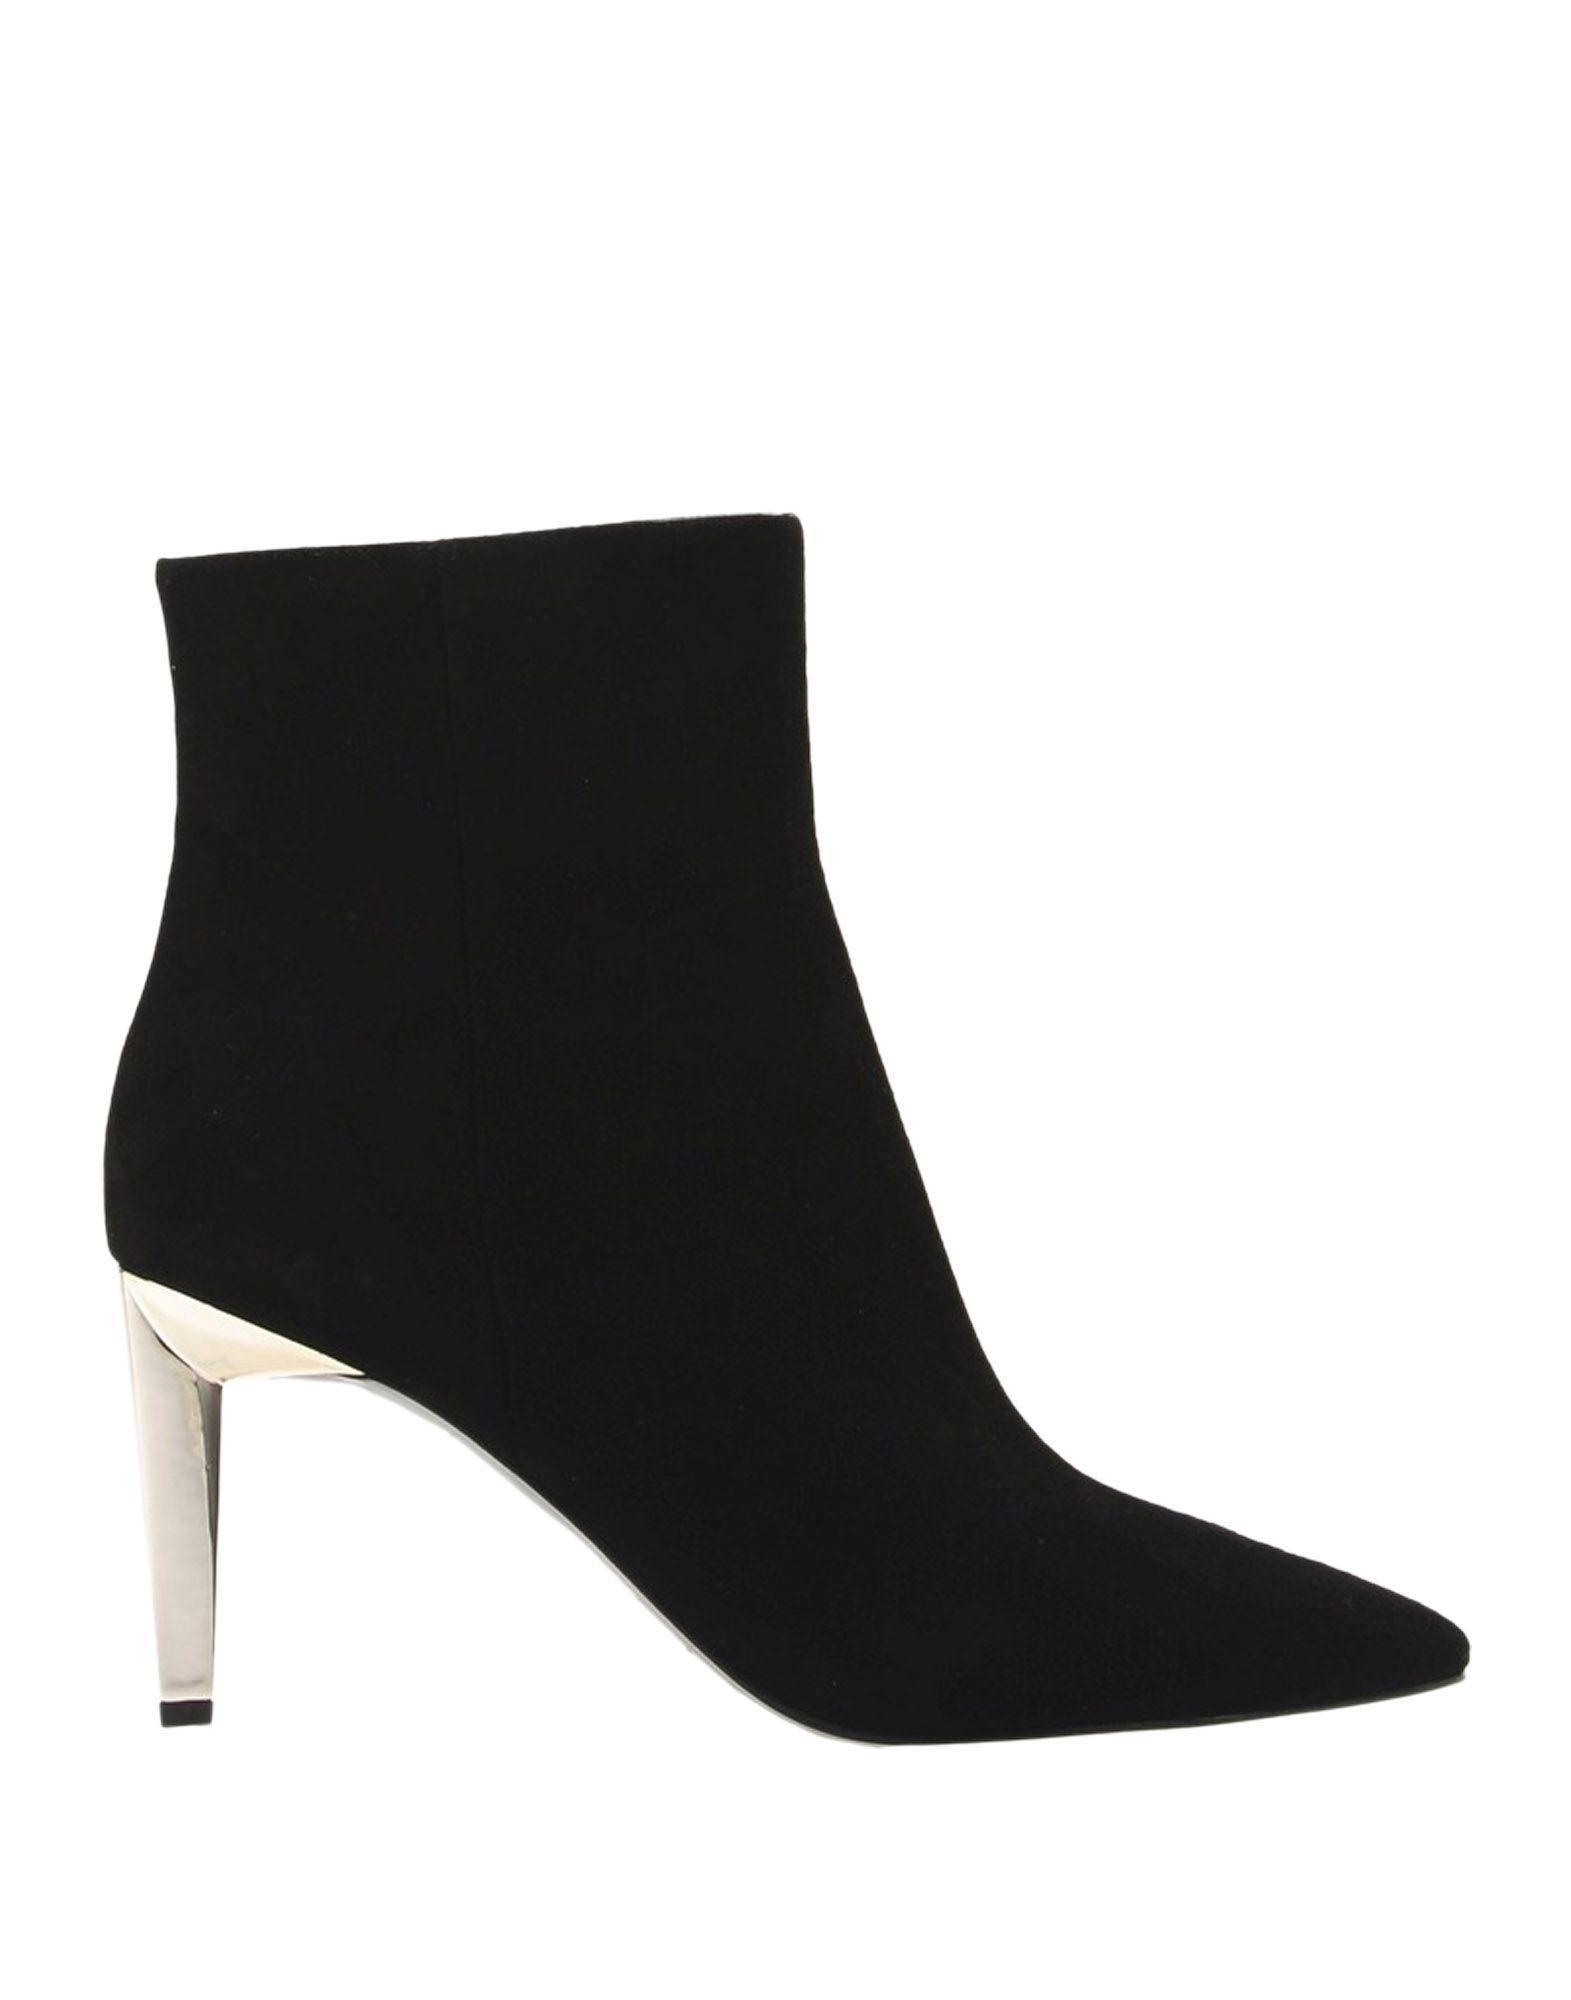 Kendall + + Kendall Kylie Kkzoe - Ankle Boot - Women Kendall + Kylie Ankle Boots online on  United Kingdom - 11557443PE 5b52c5